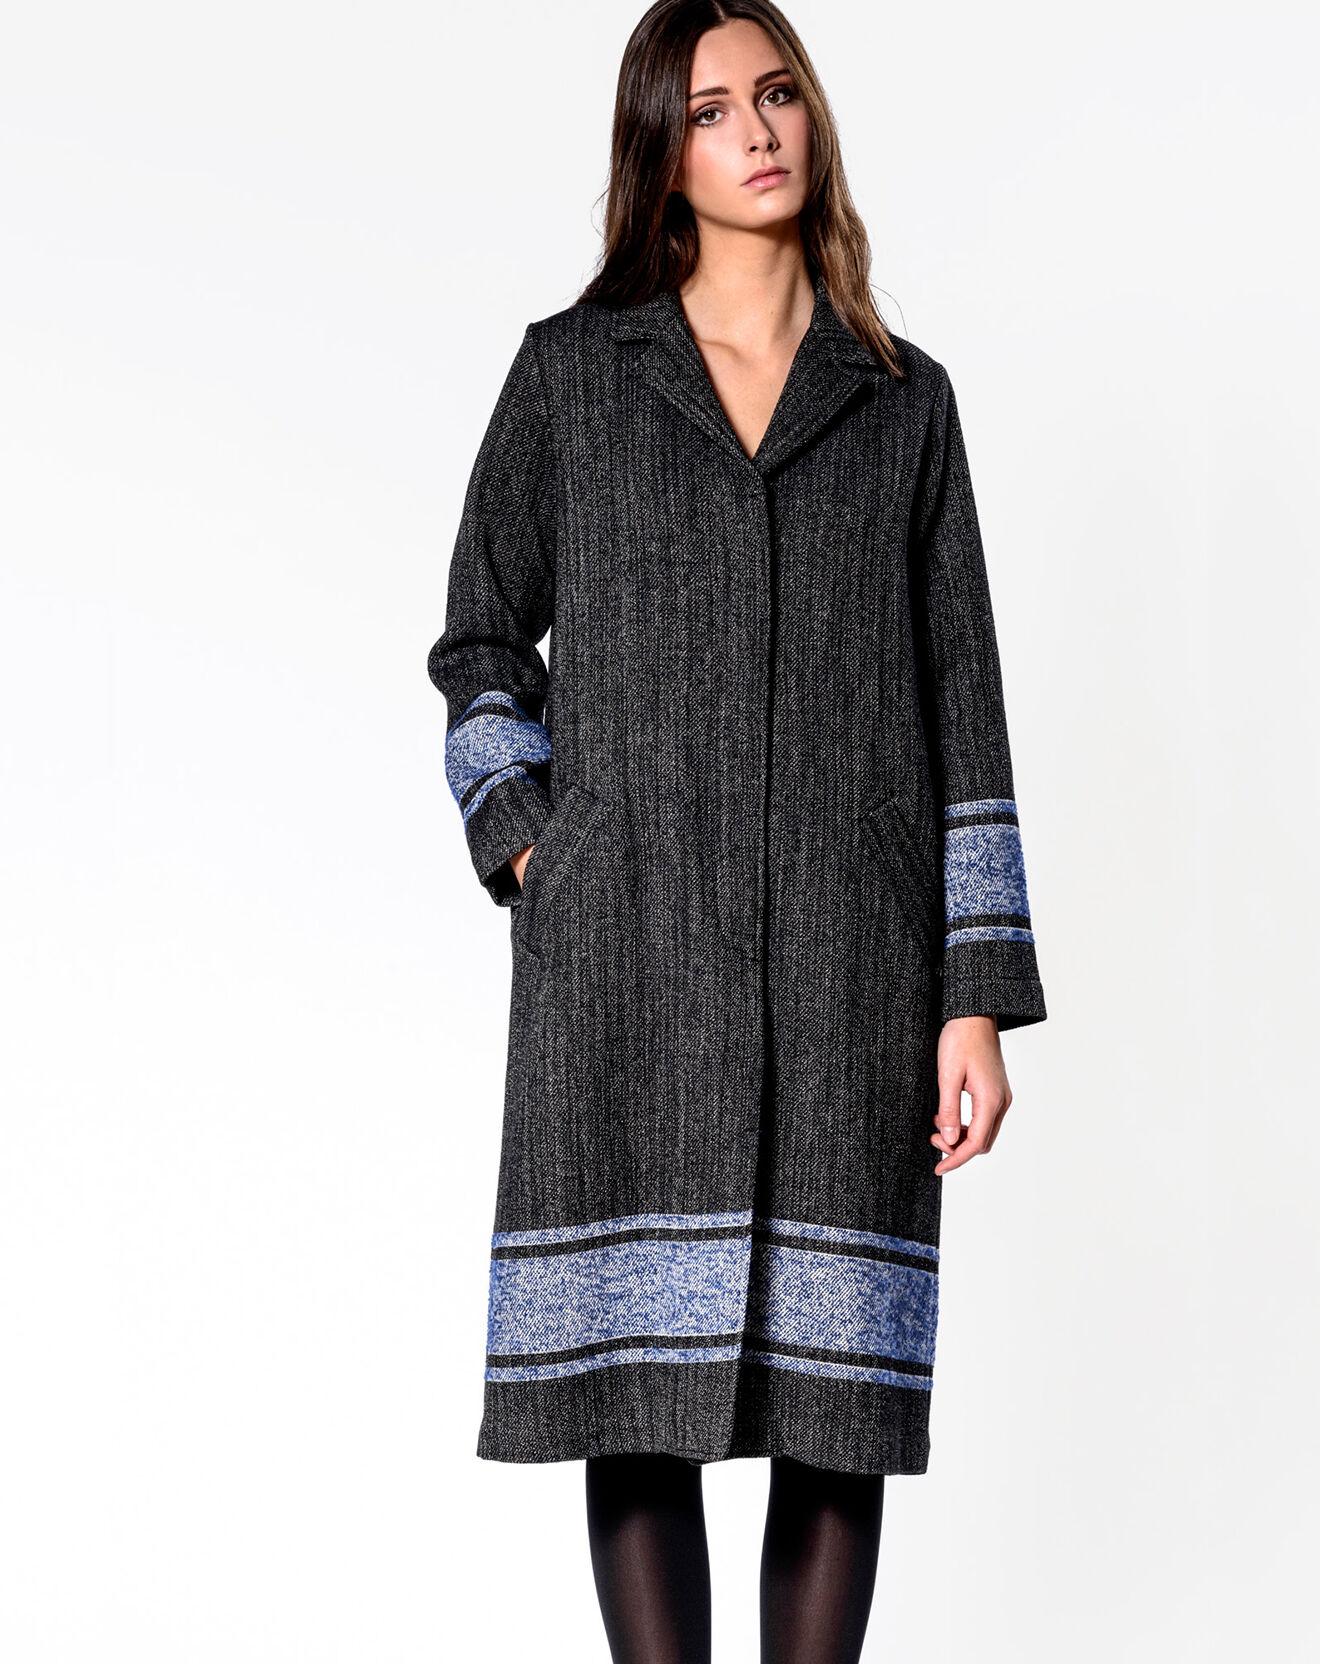 Manteau Luks gris/bleu - Bellerose - Modalova